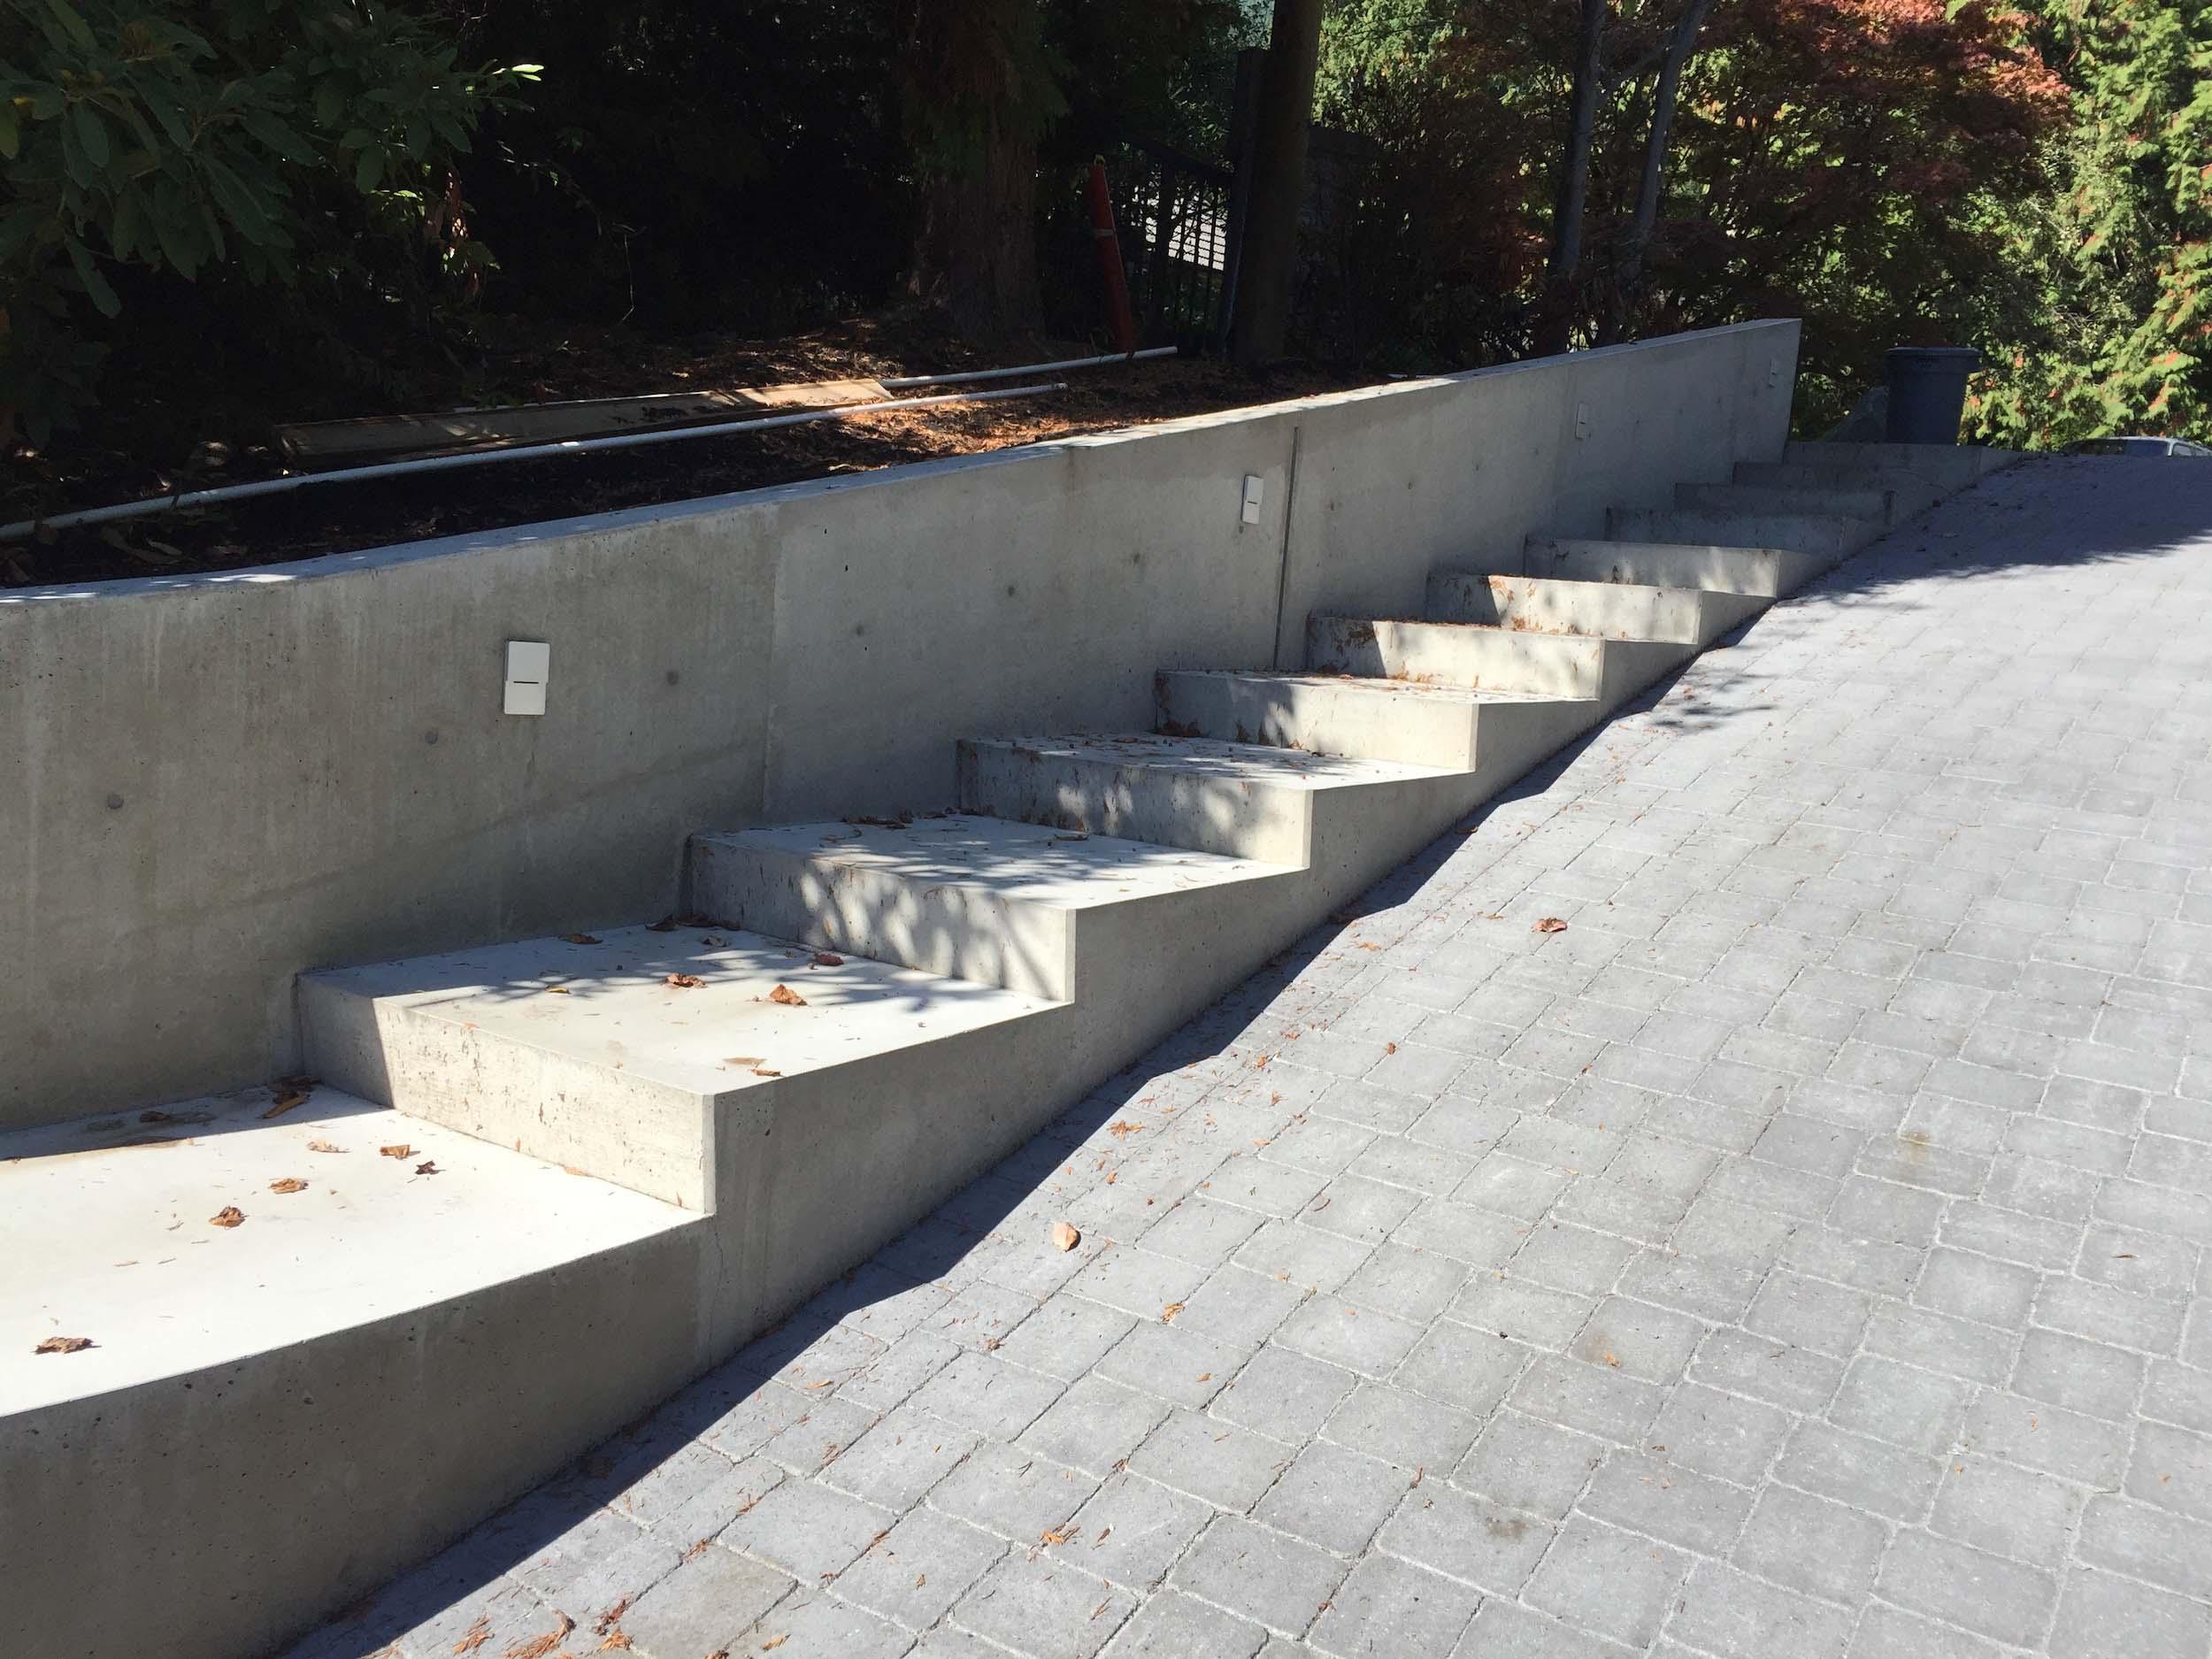 Postle_Construction_ConcreteForming28.jpg